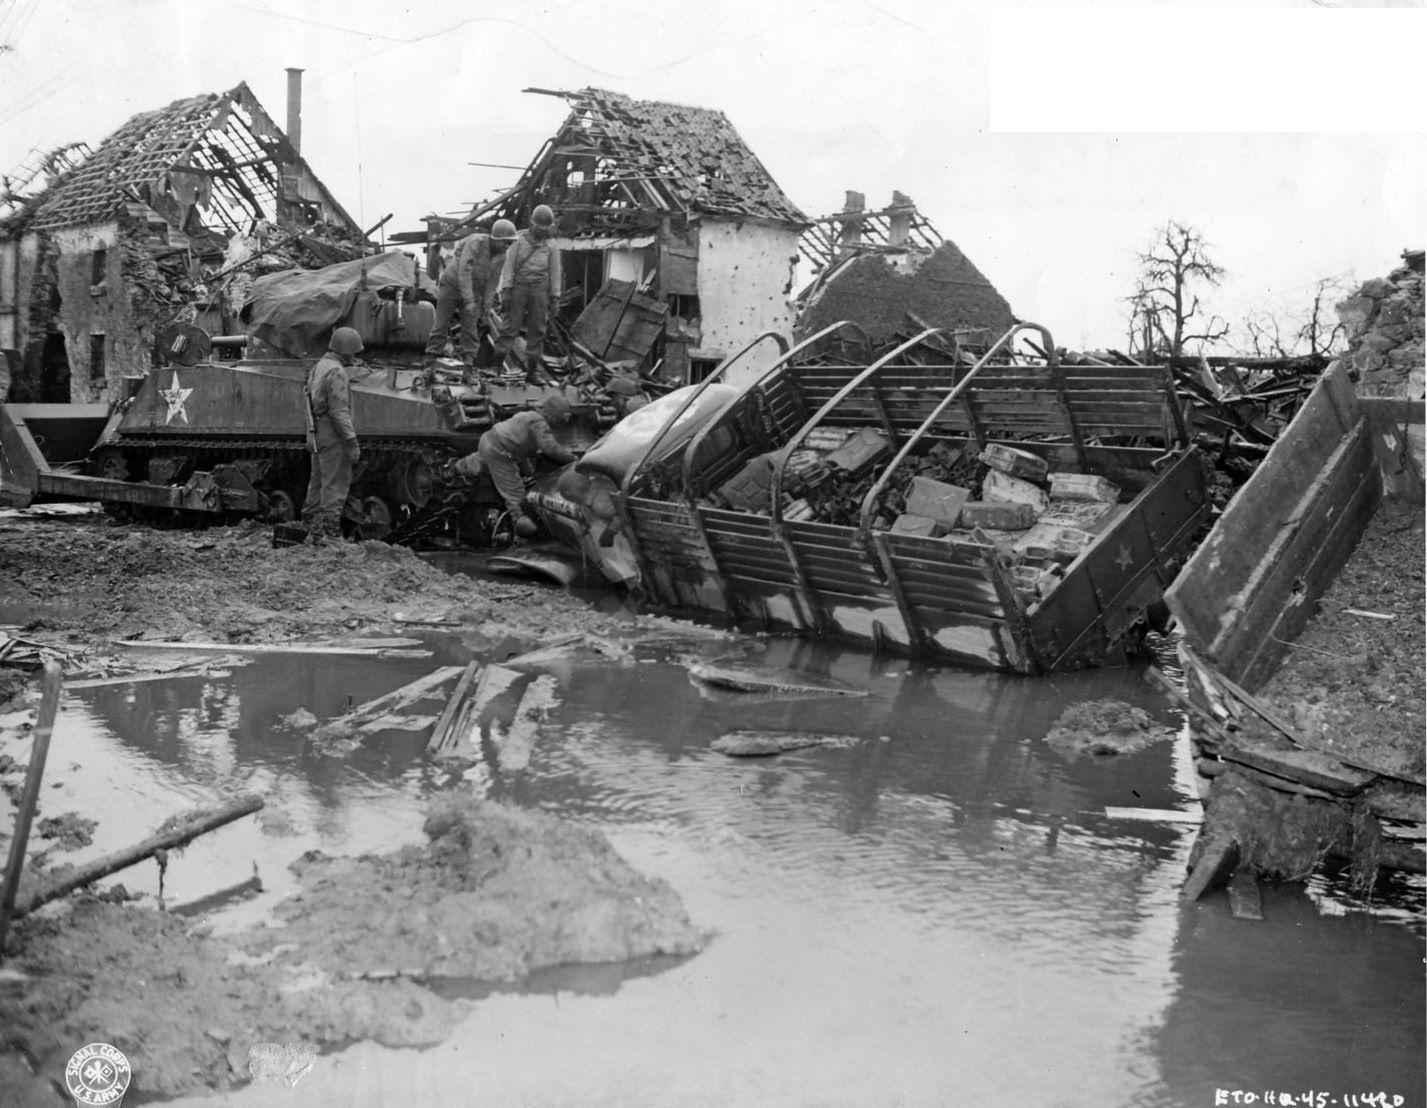 M4 Bulldozer tank and overturned trucks in Merode Germany